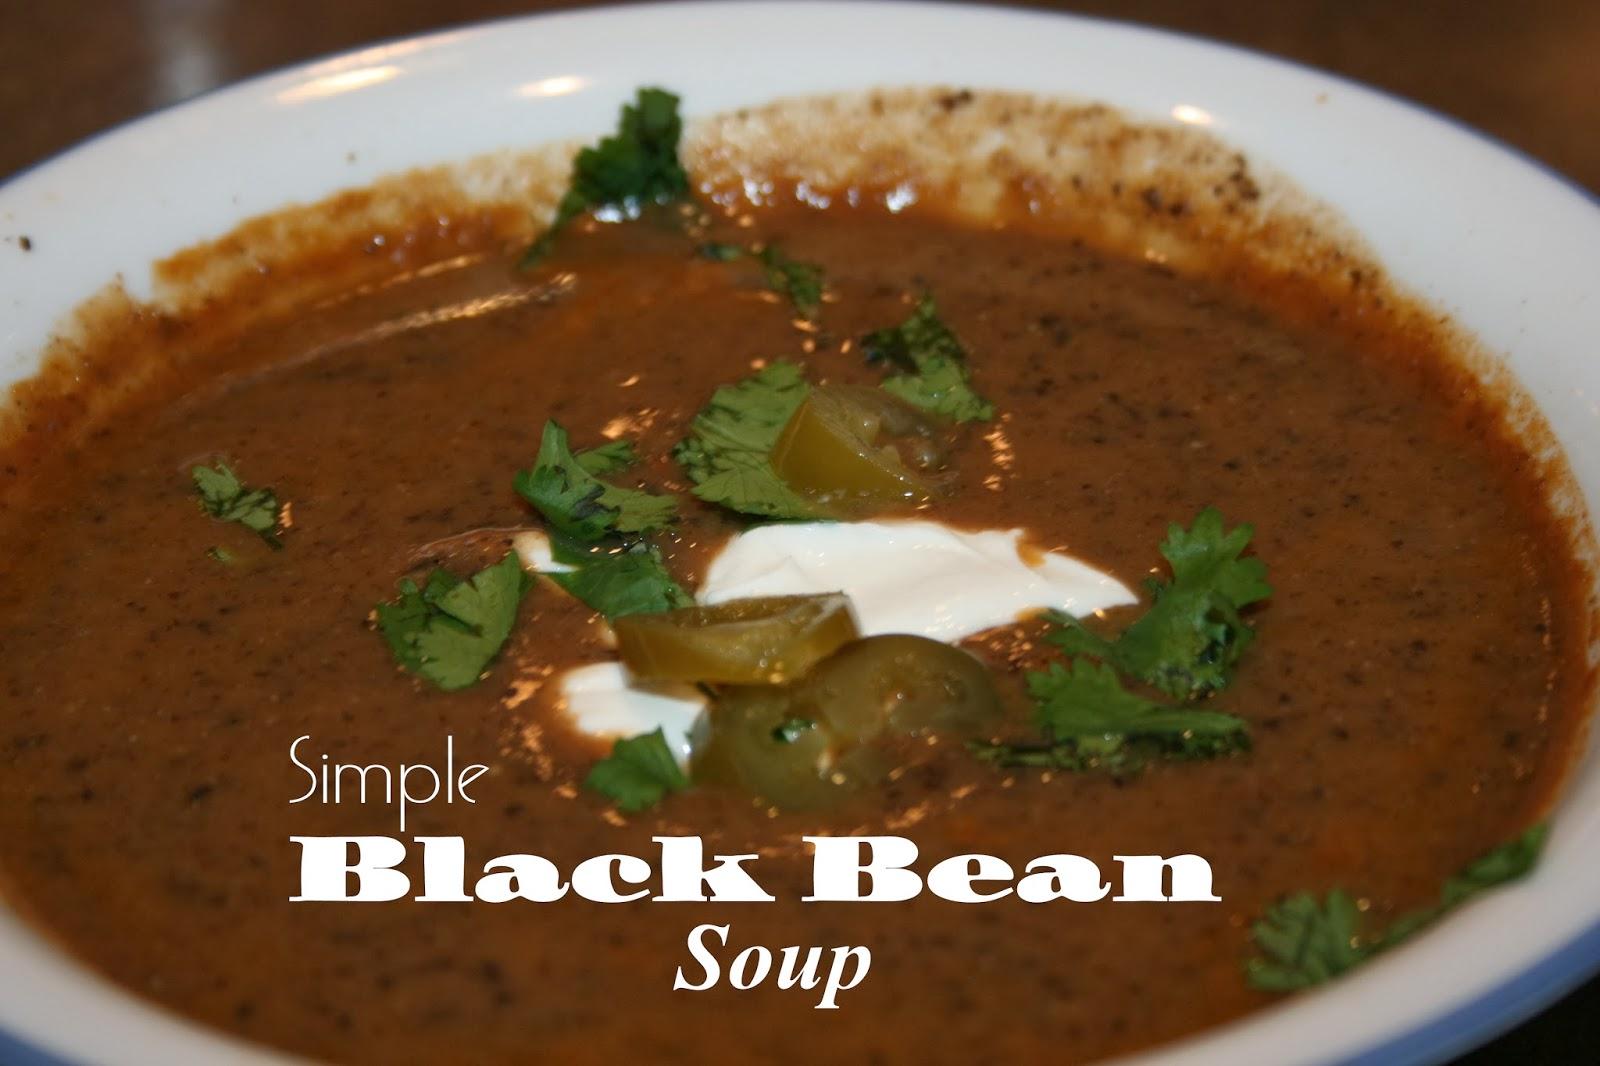 JOY Unspeakable: Black Bean Soup!